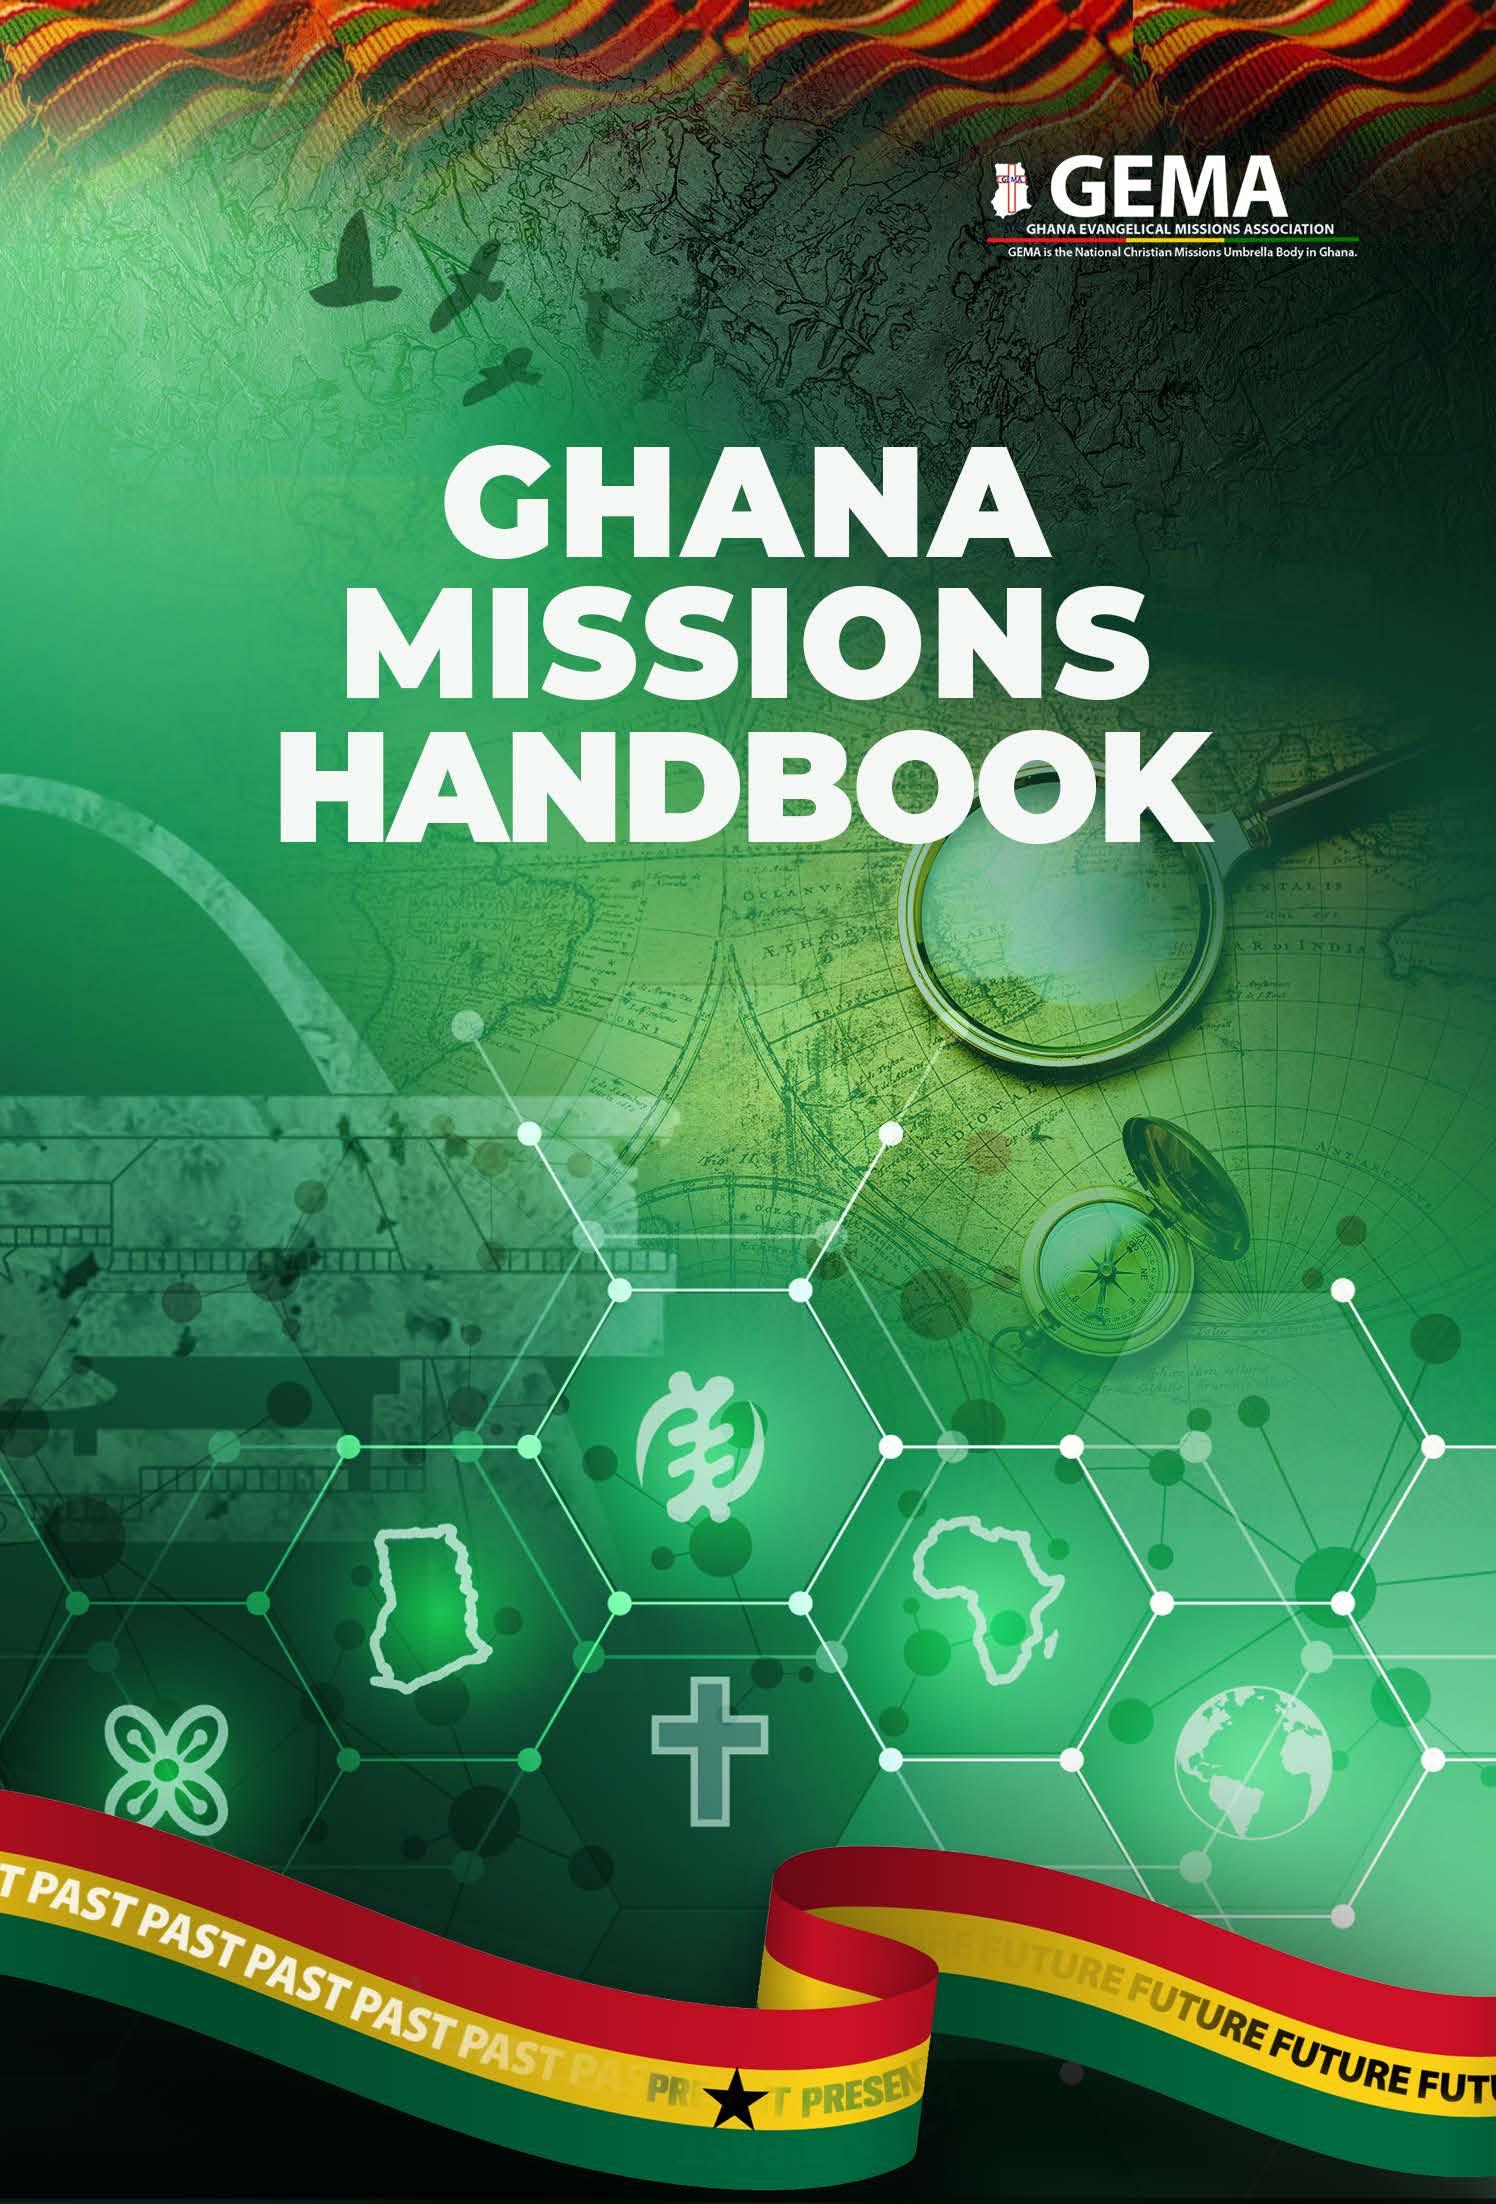 Ghana Missions Handbook_GEMA_Page_001